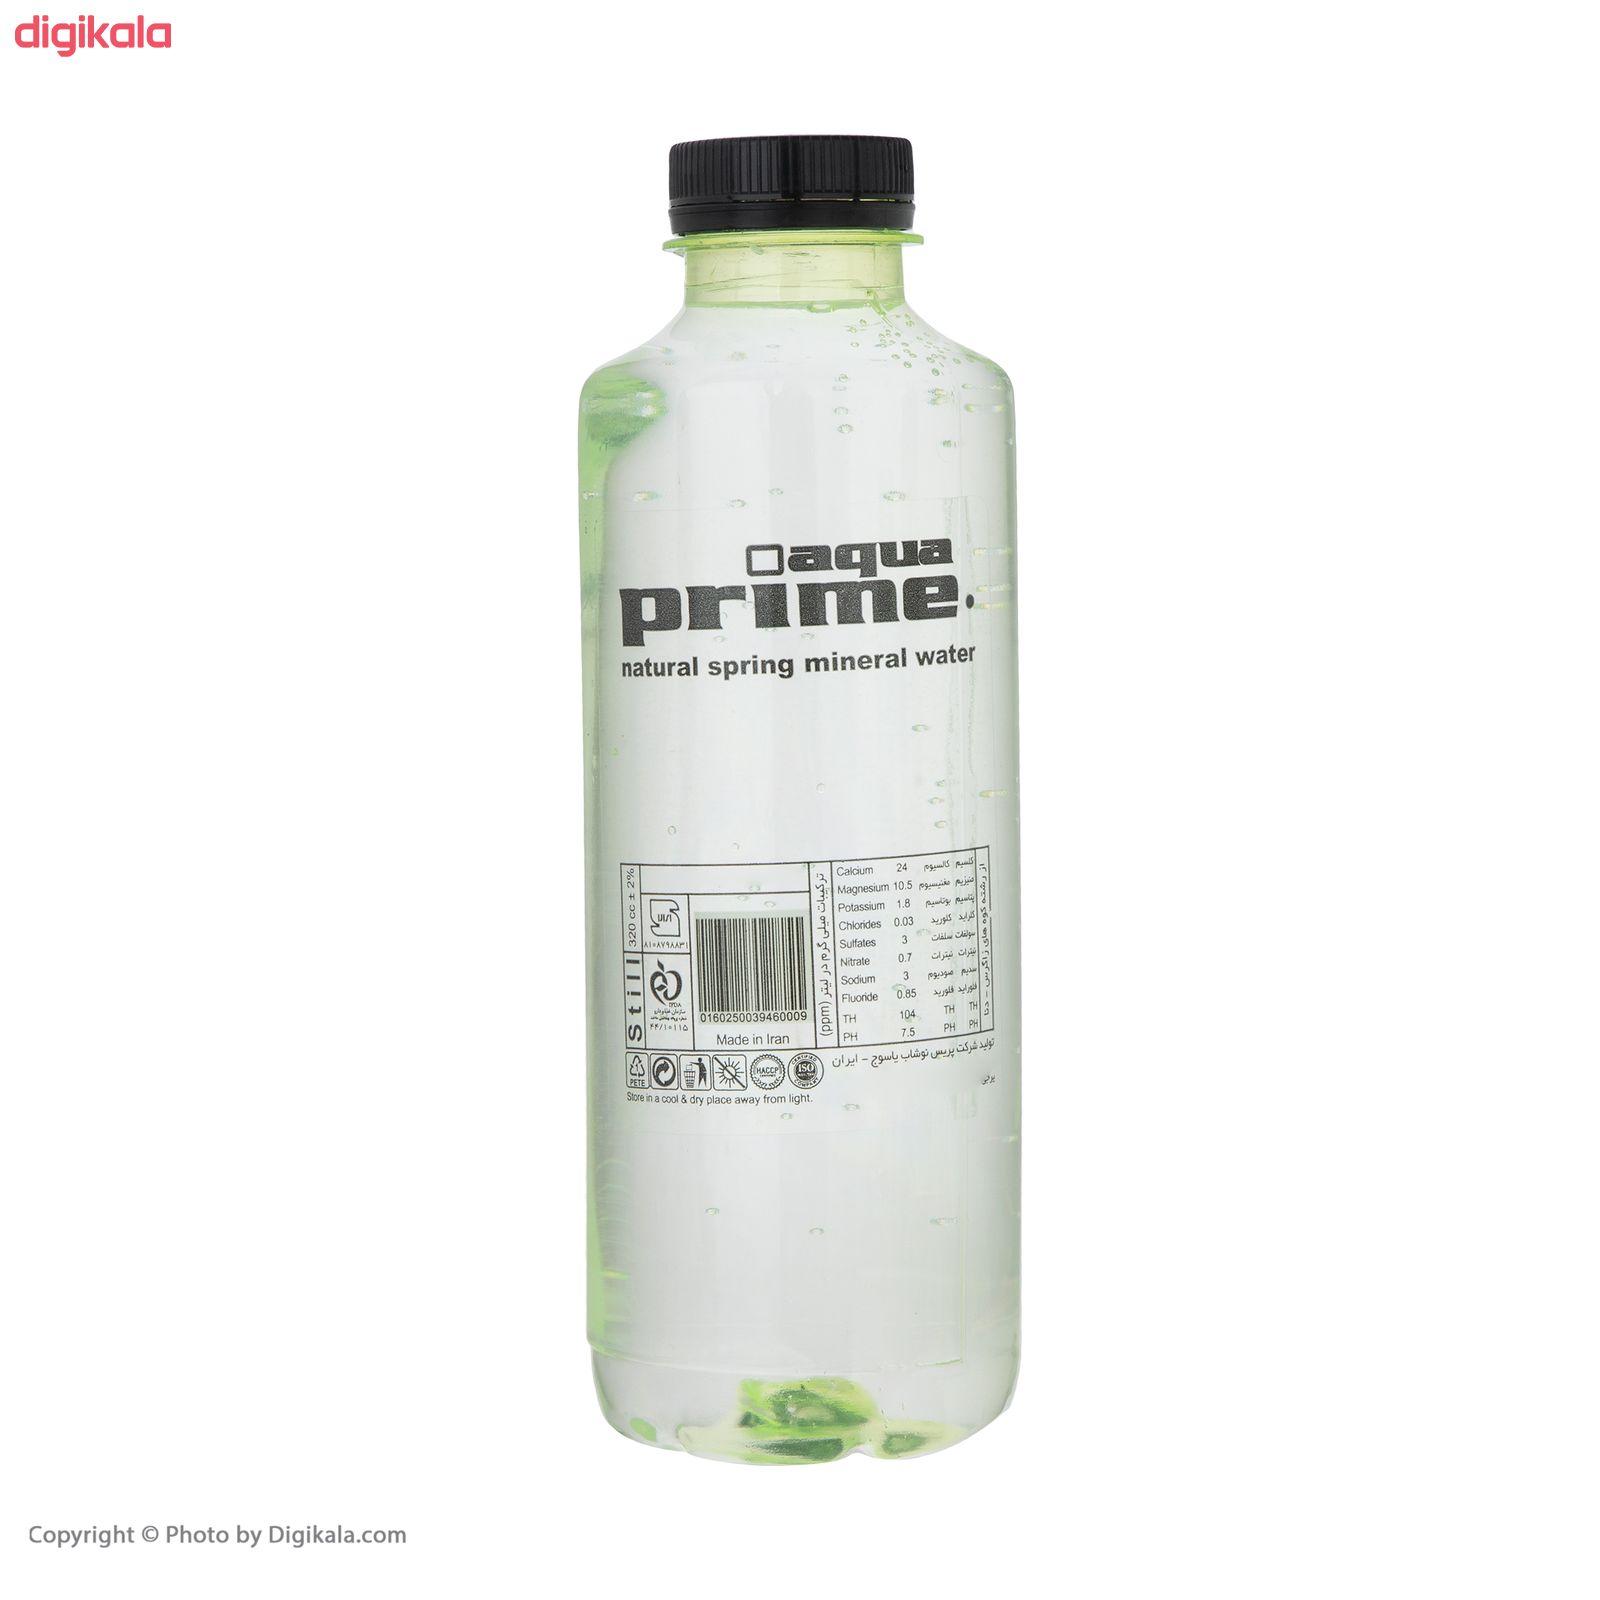 آب معدنی آکوا پرایم ویژه -300 میلی لیتر بسته 12 عددی main 1 4